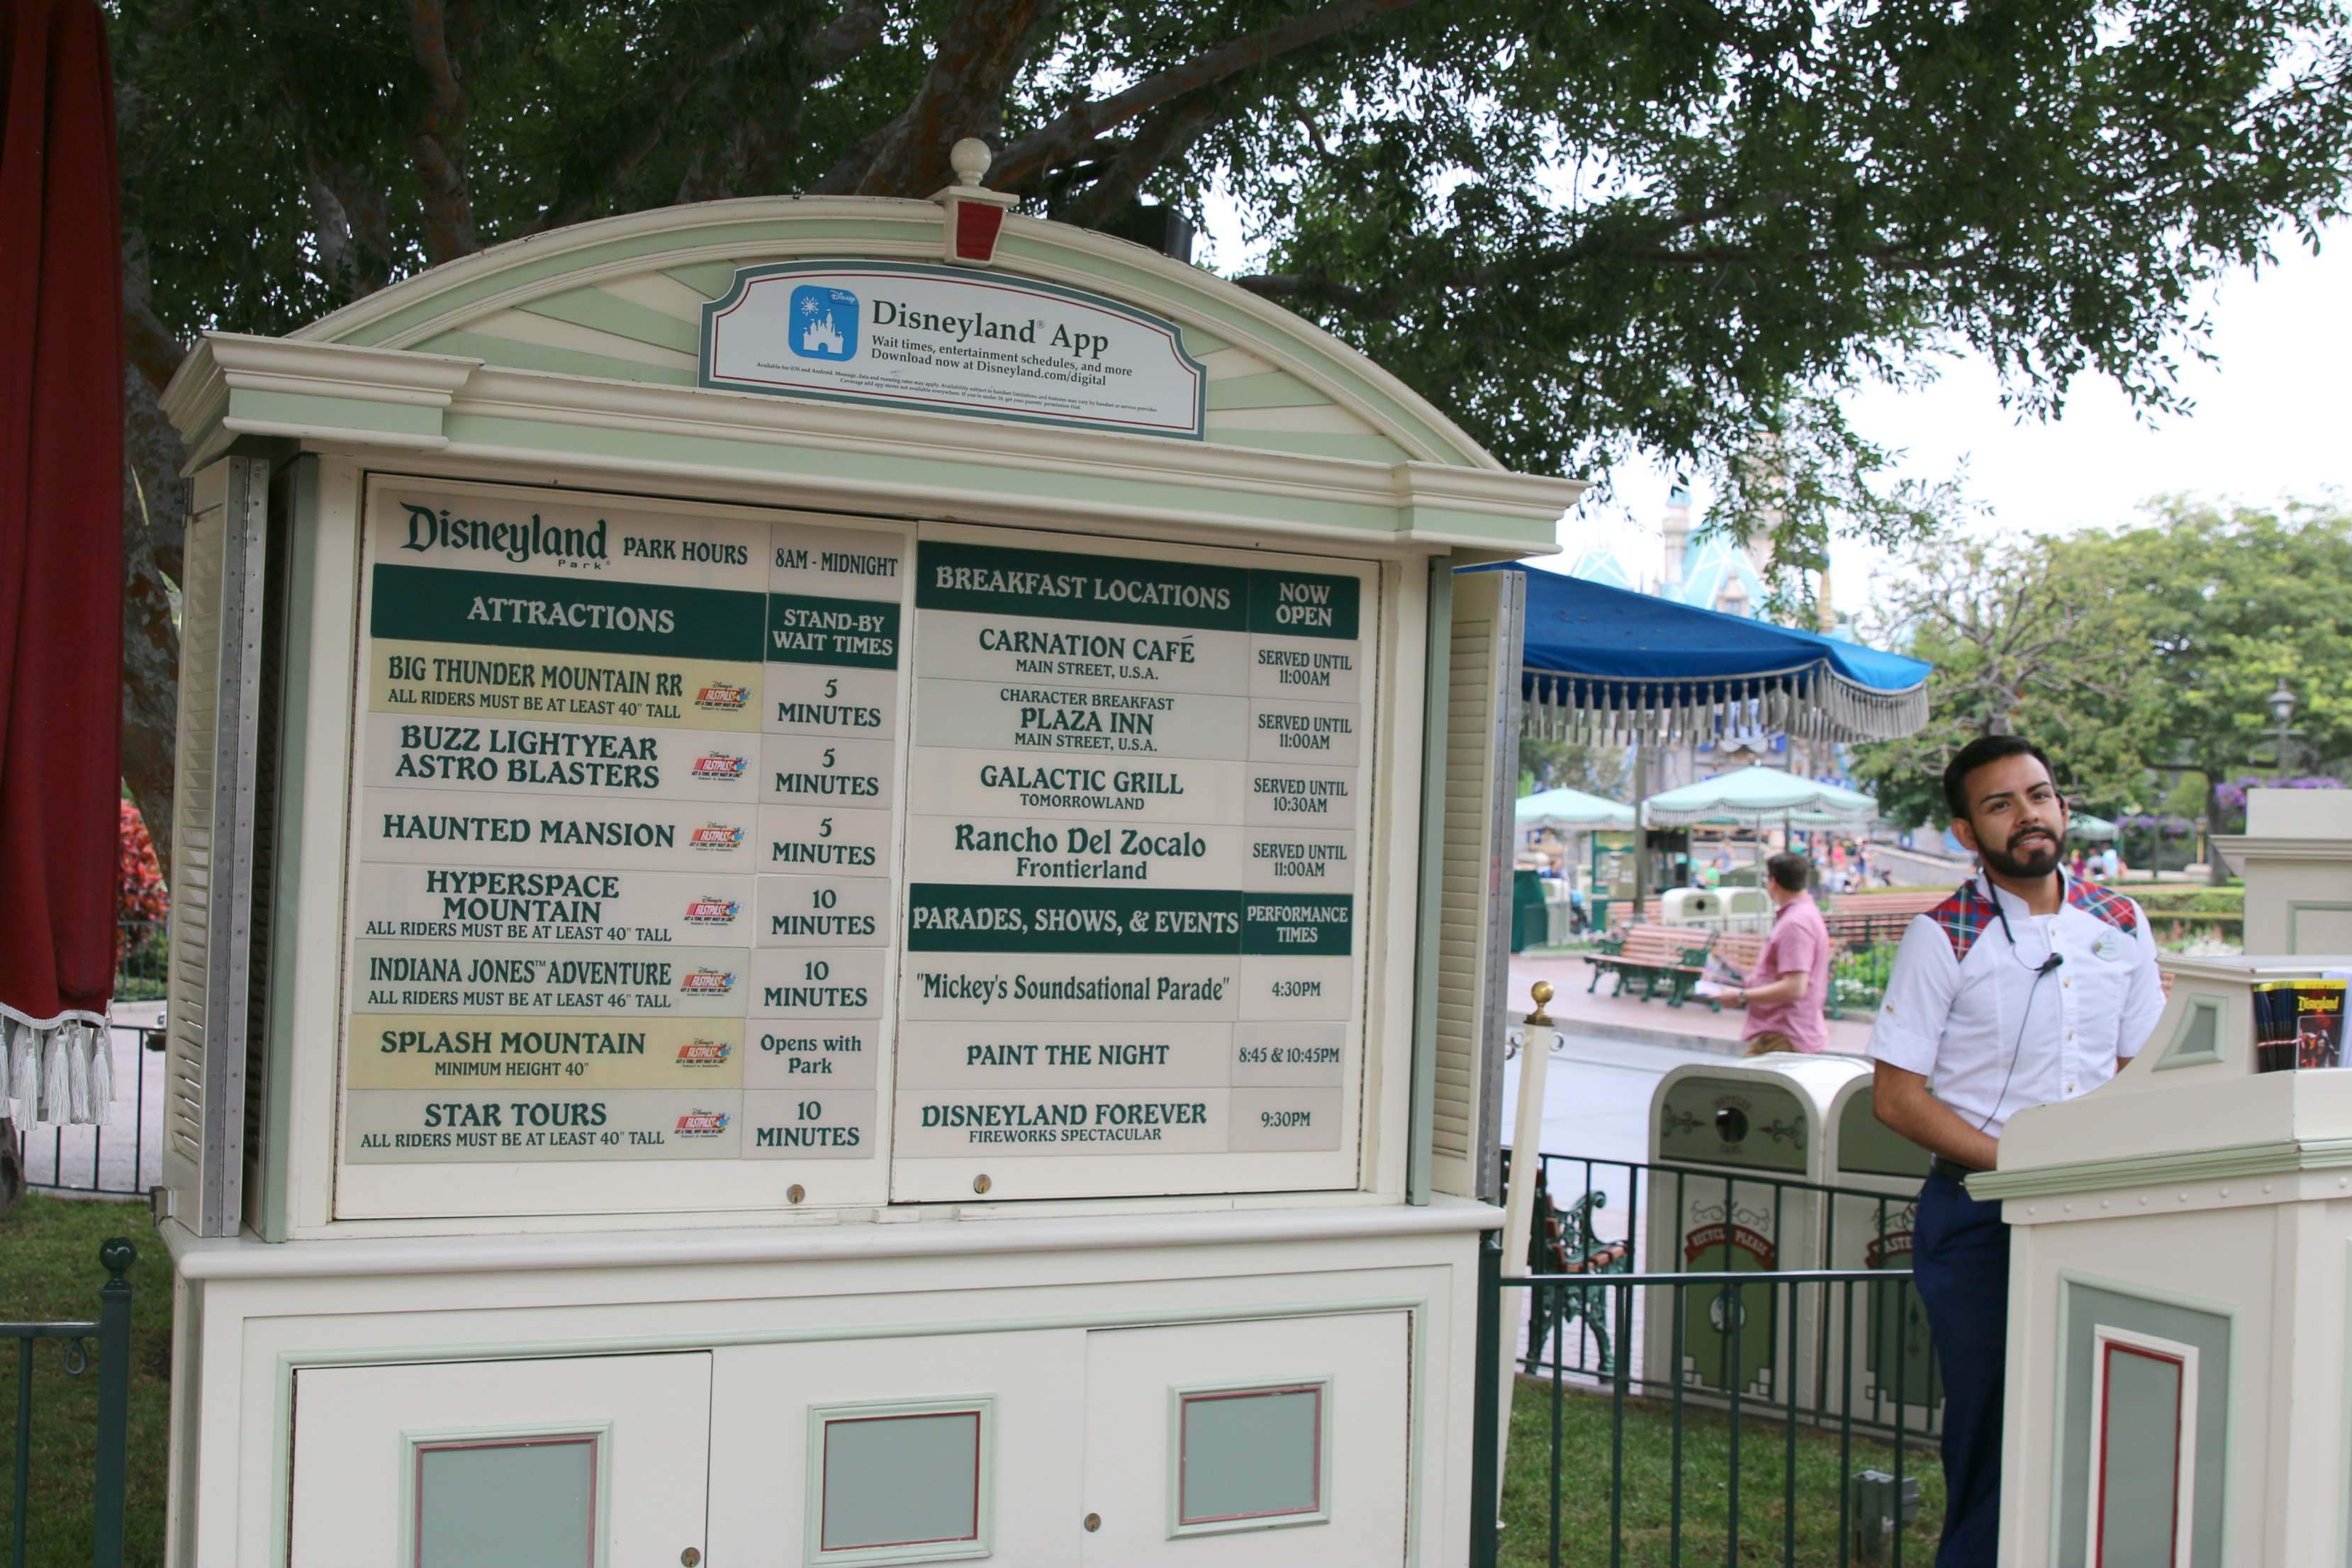 Disneyland wait times